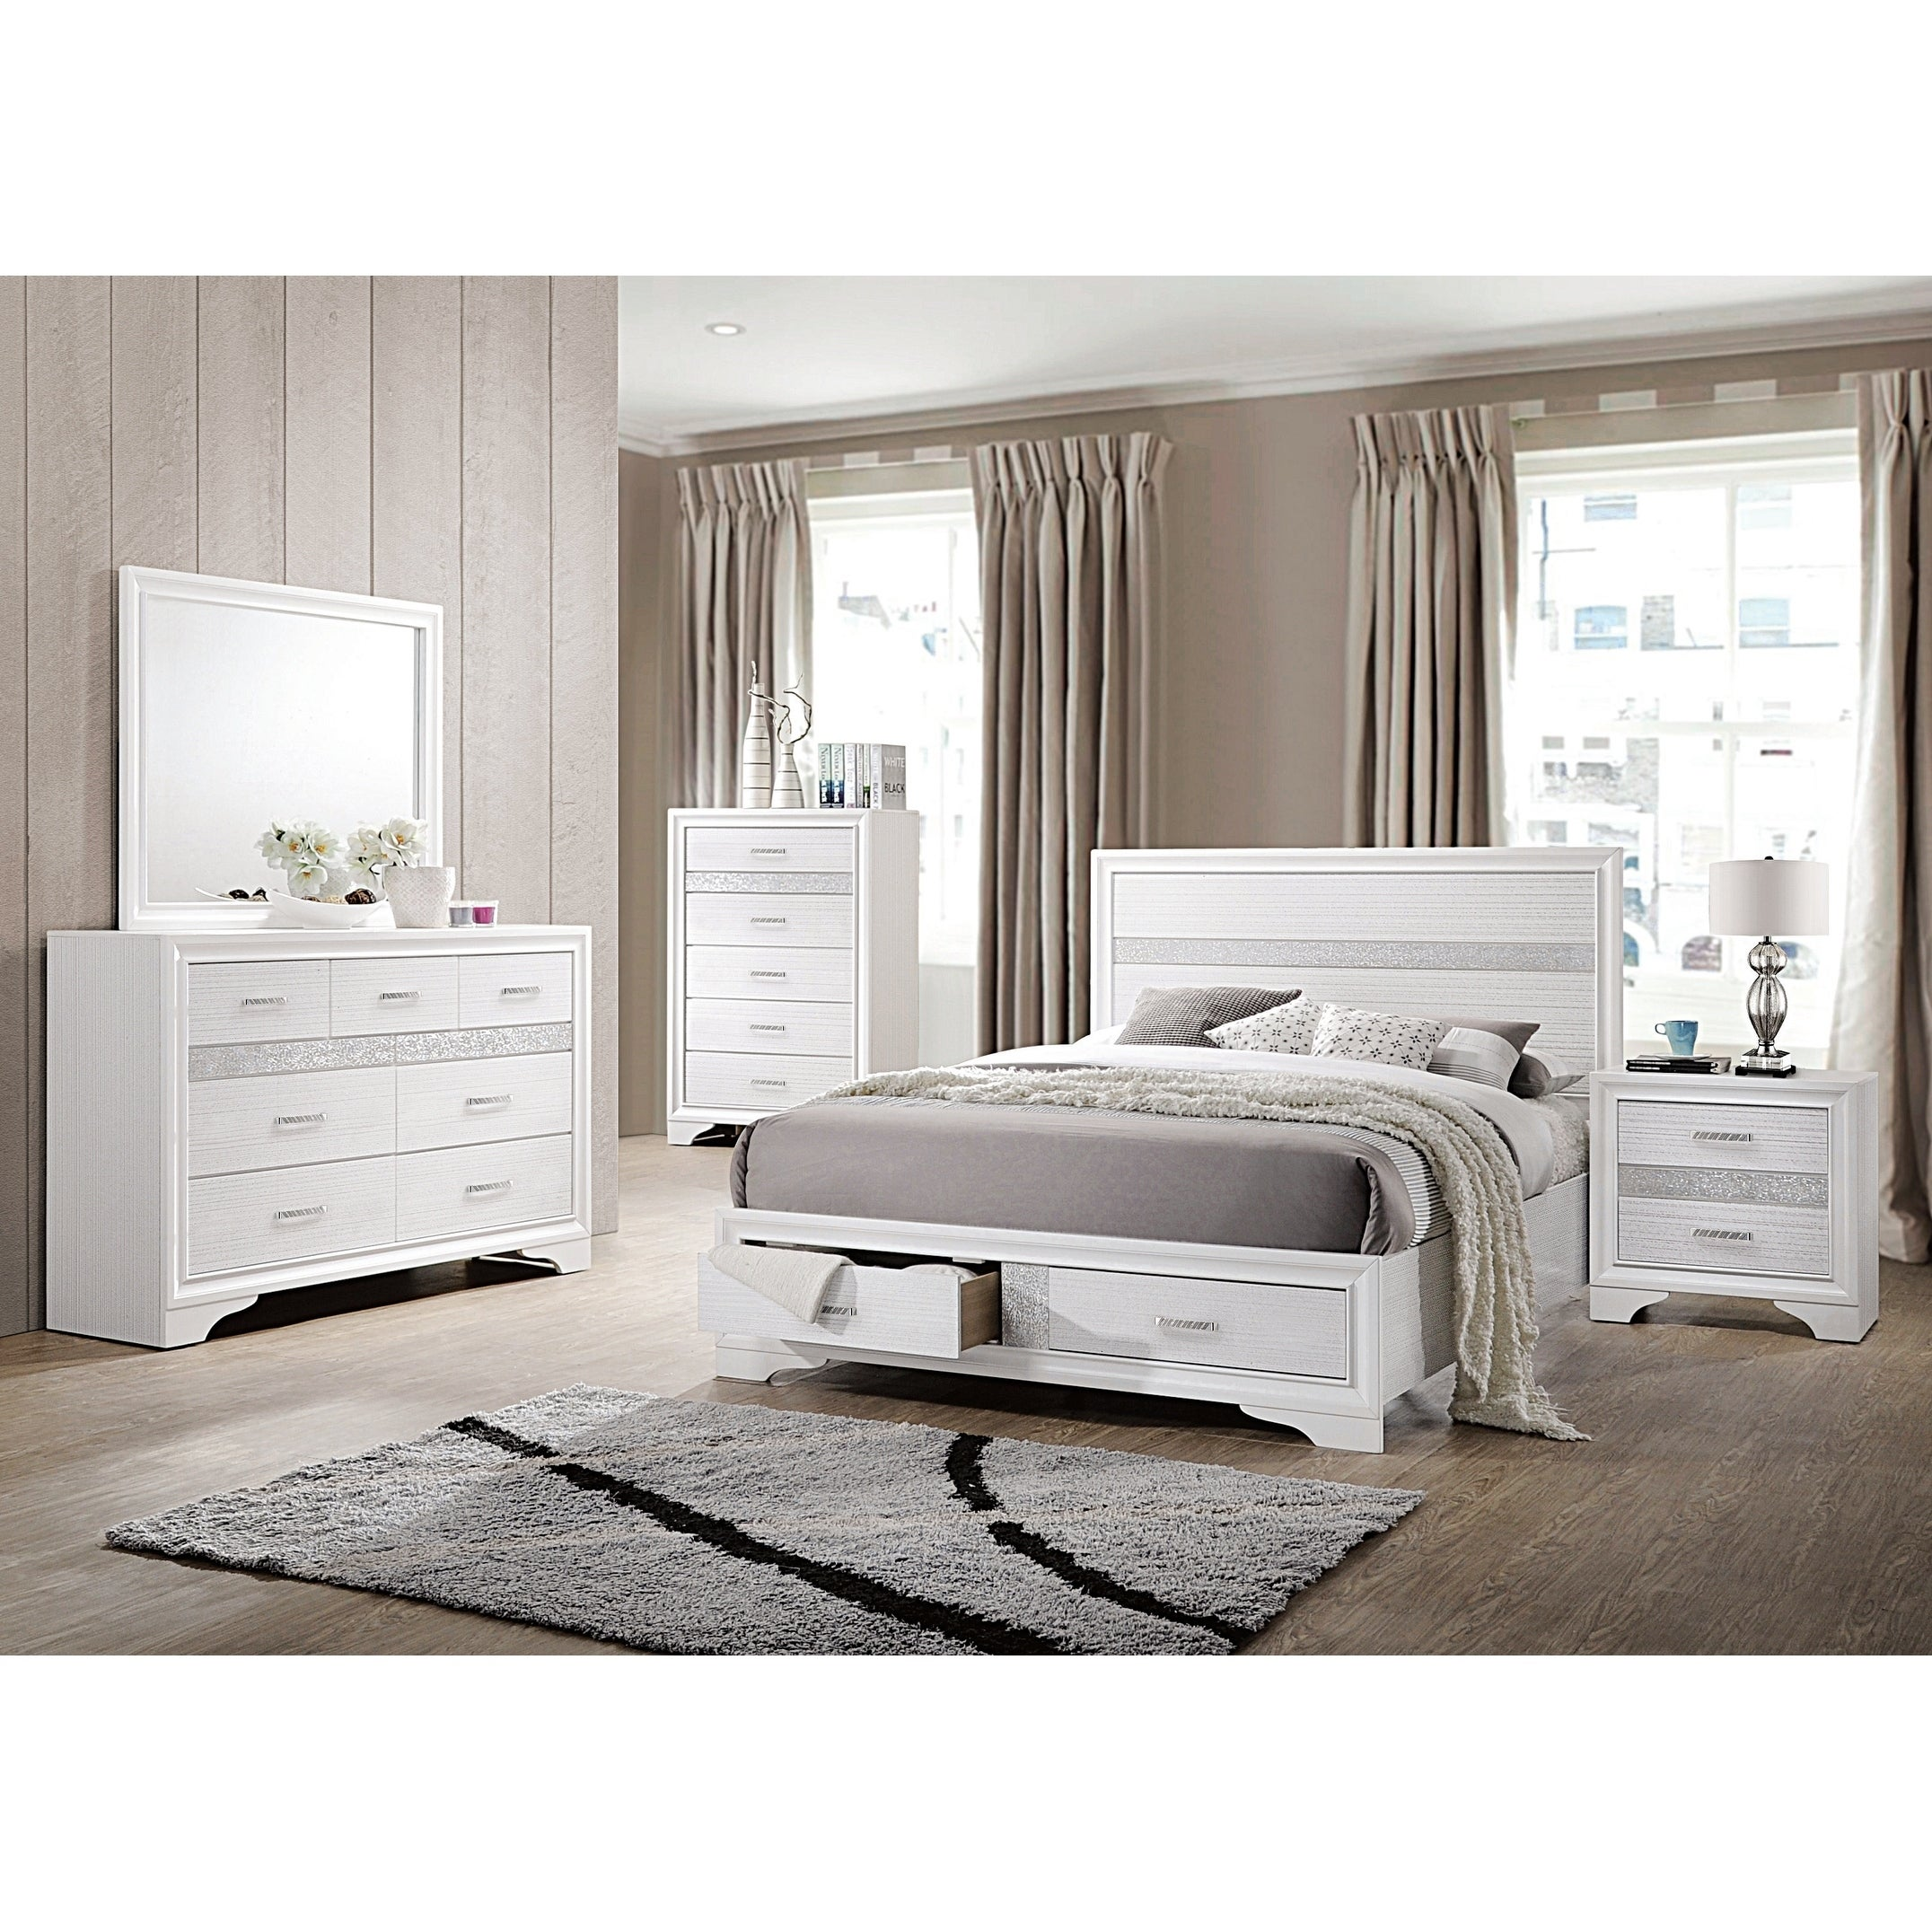 Shop Miranda Contemporary White 5-piece Bedroom Set - On Sale - Free ...